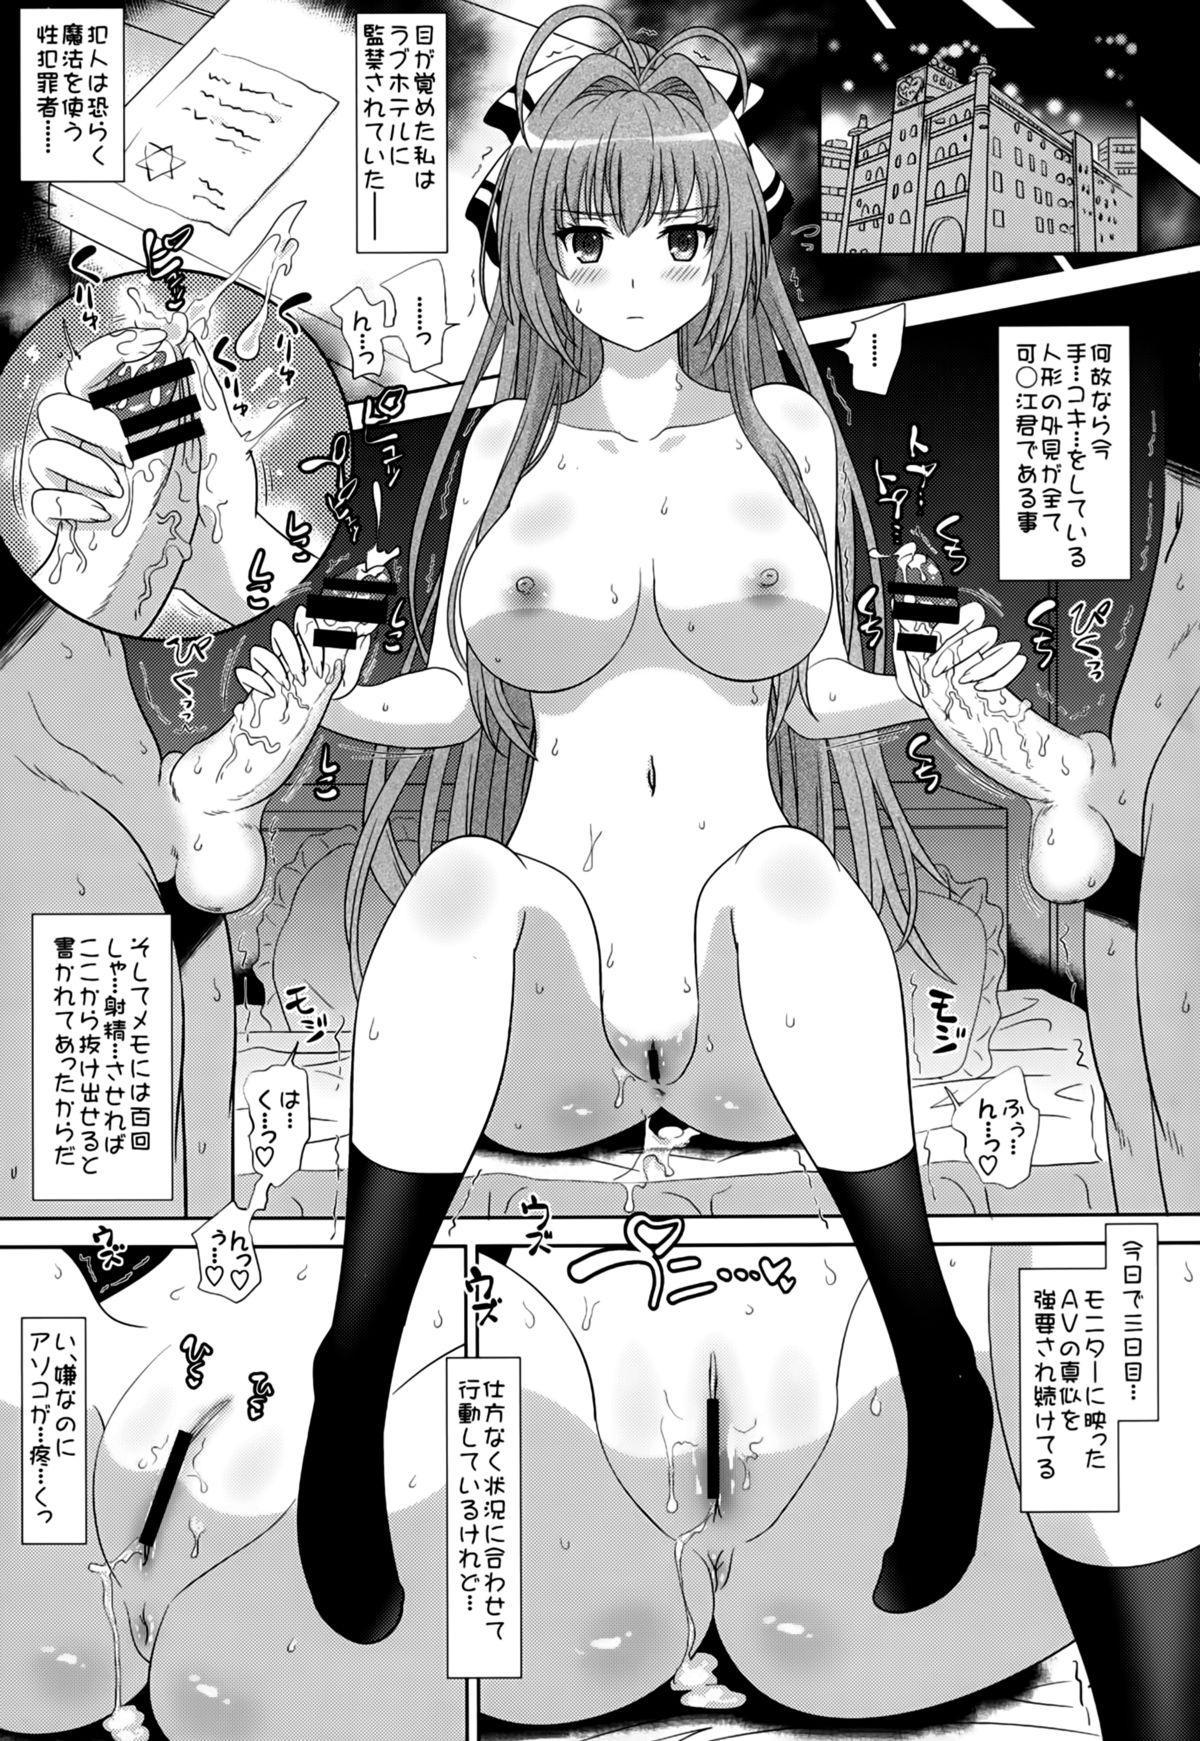 Amagi no Ecchi na Yuuenchi 2